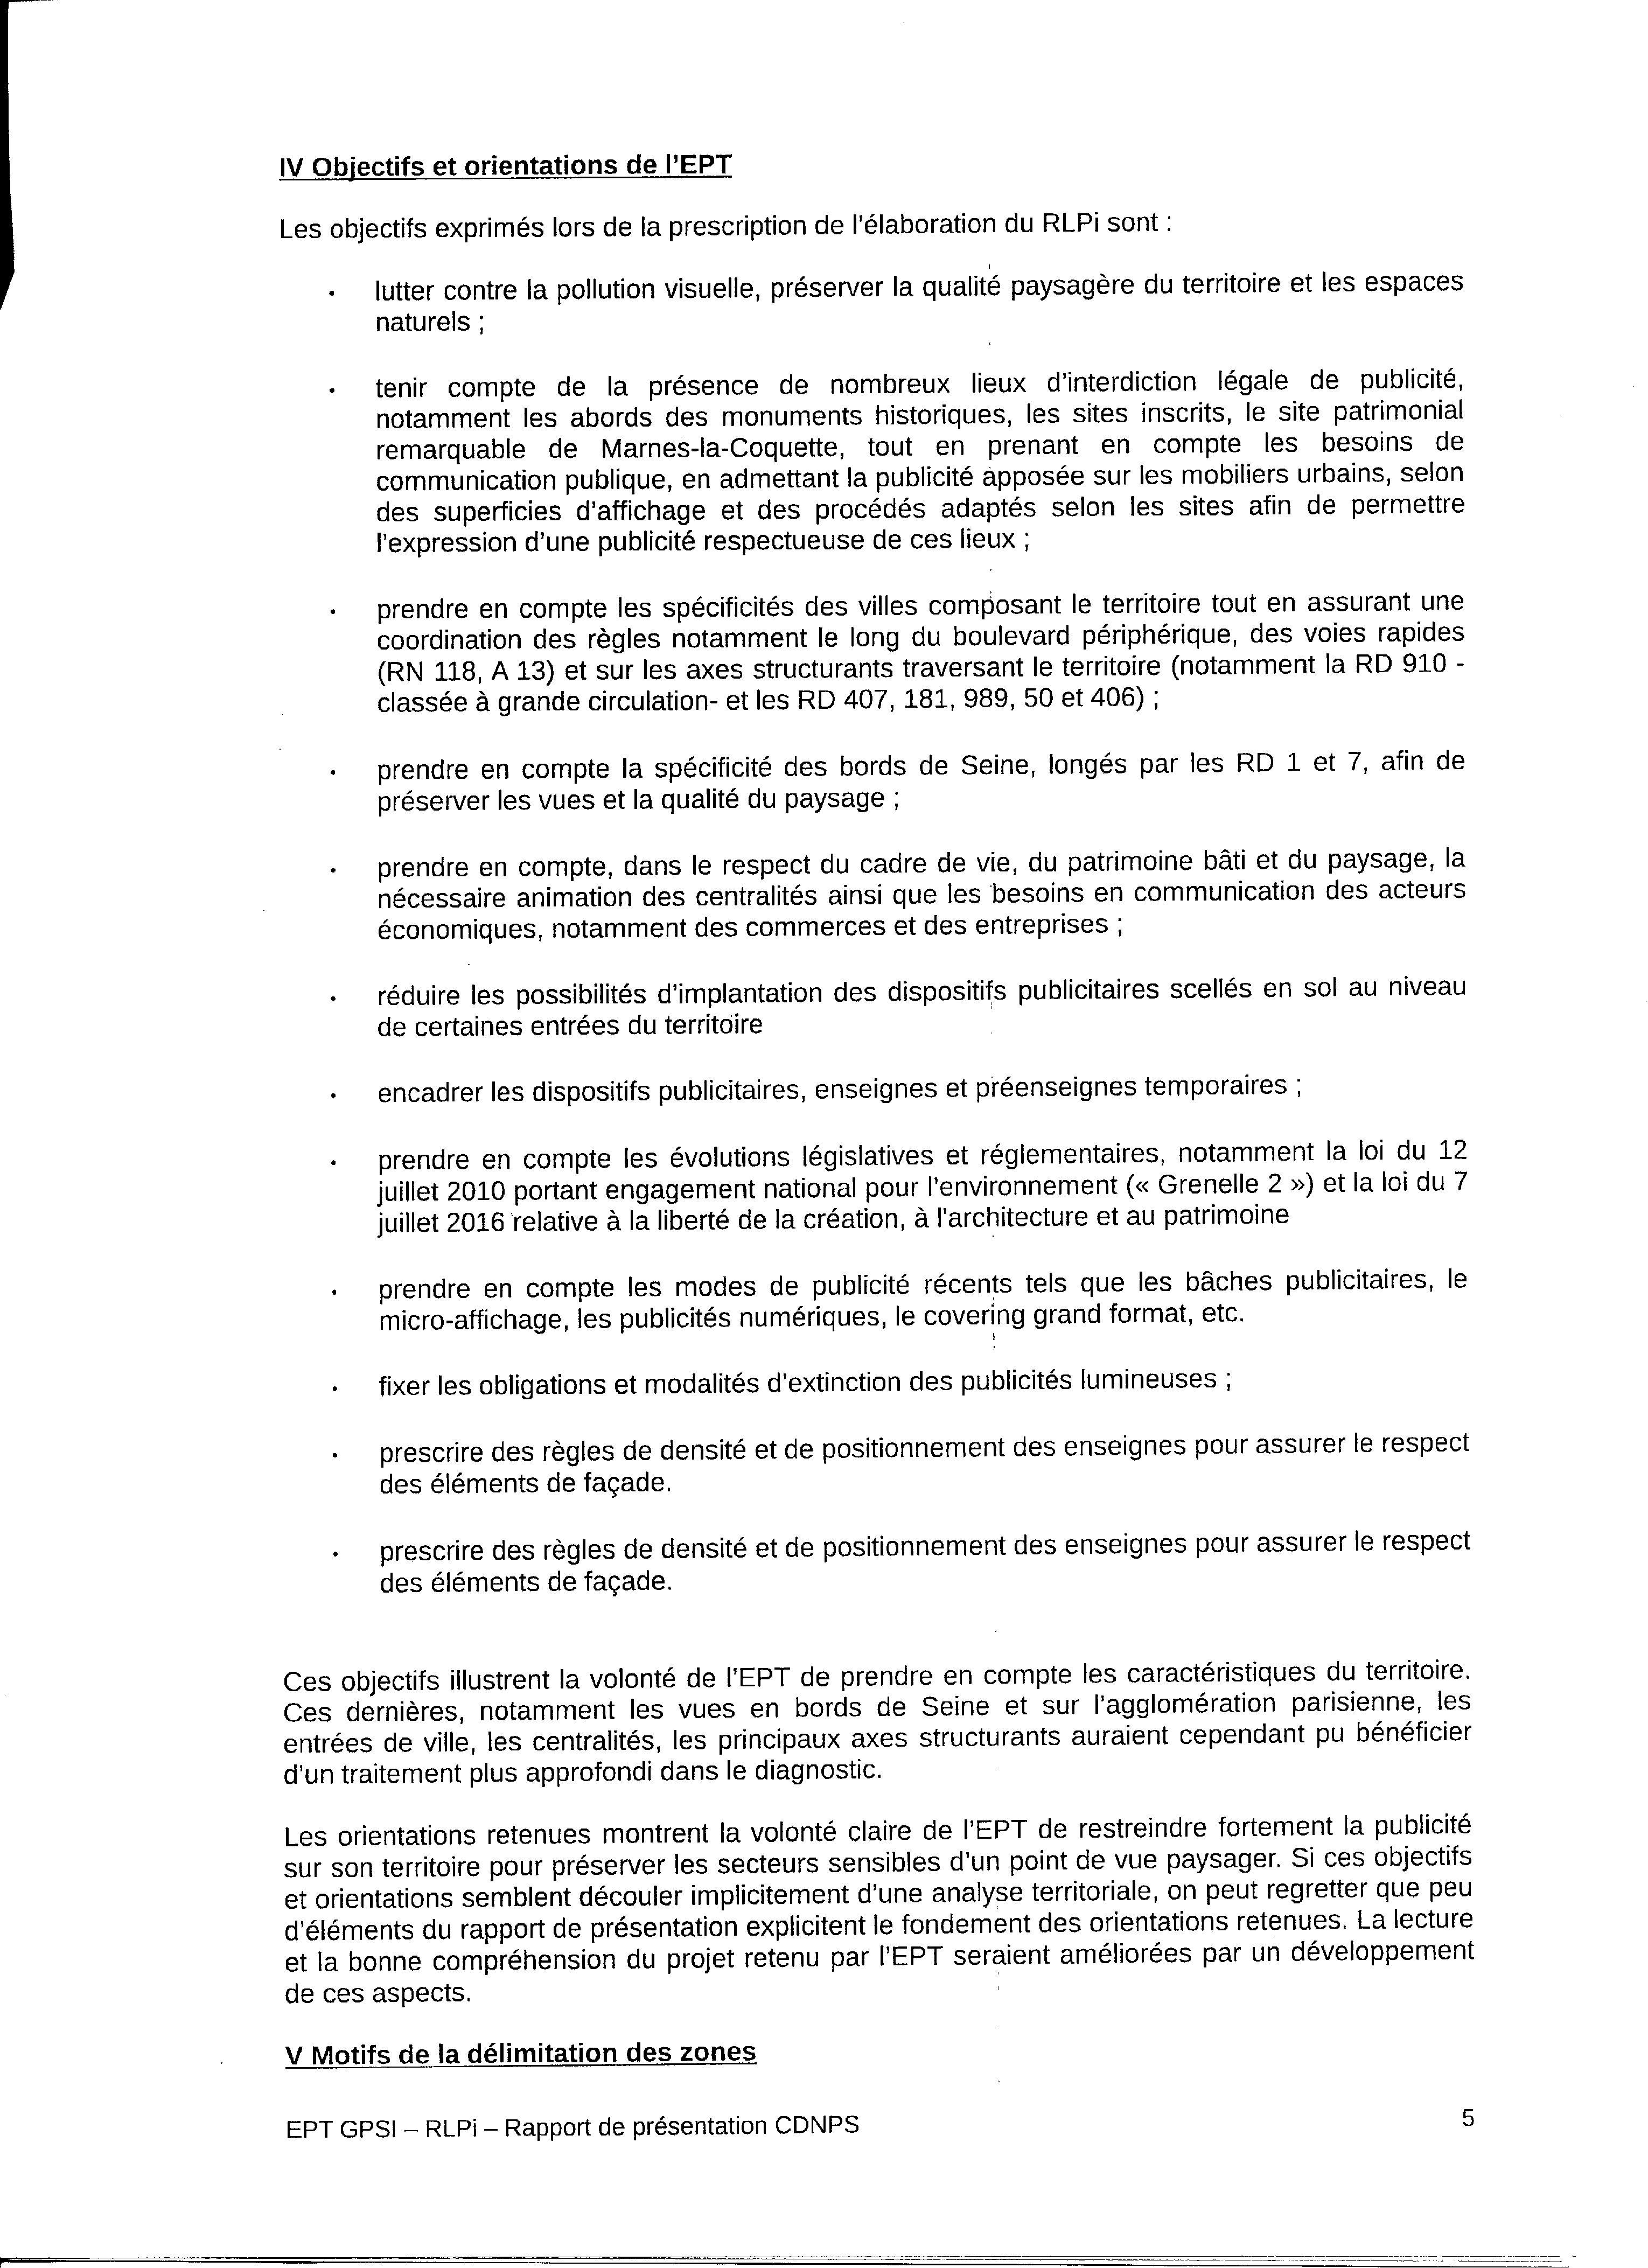 Avis Etat RLPI005